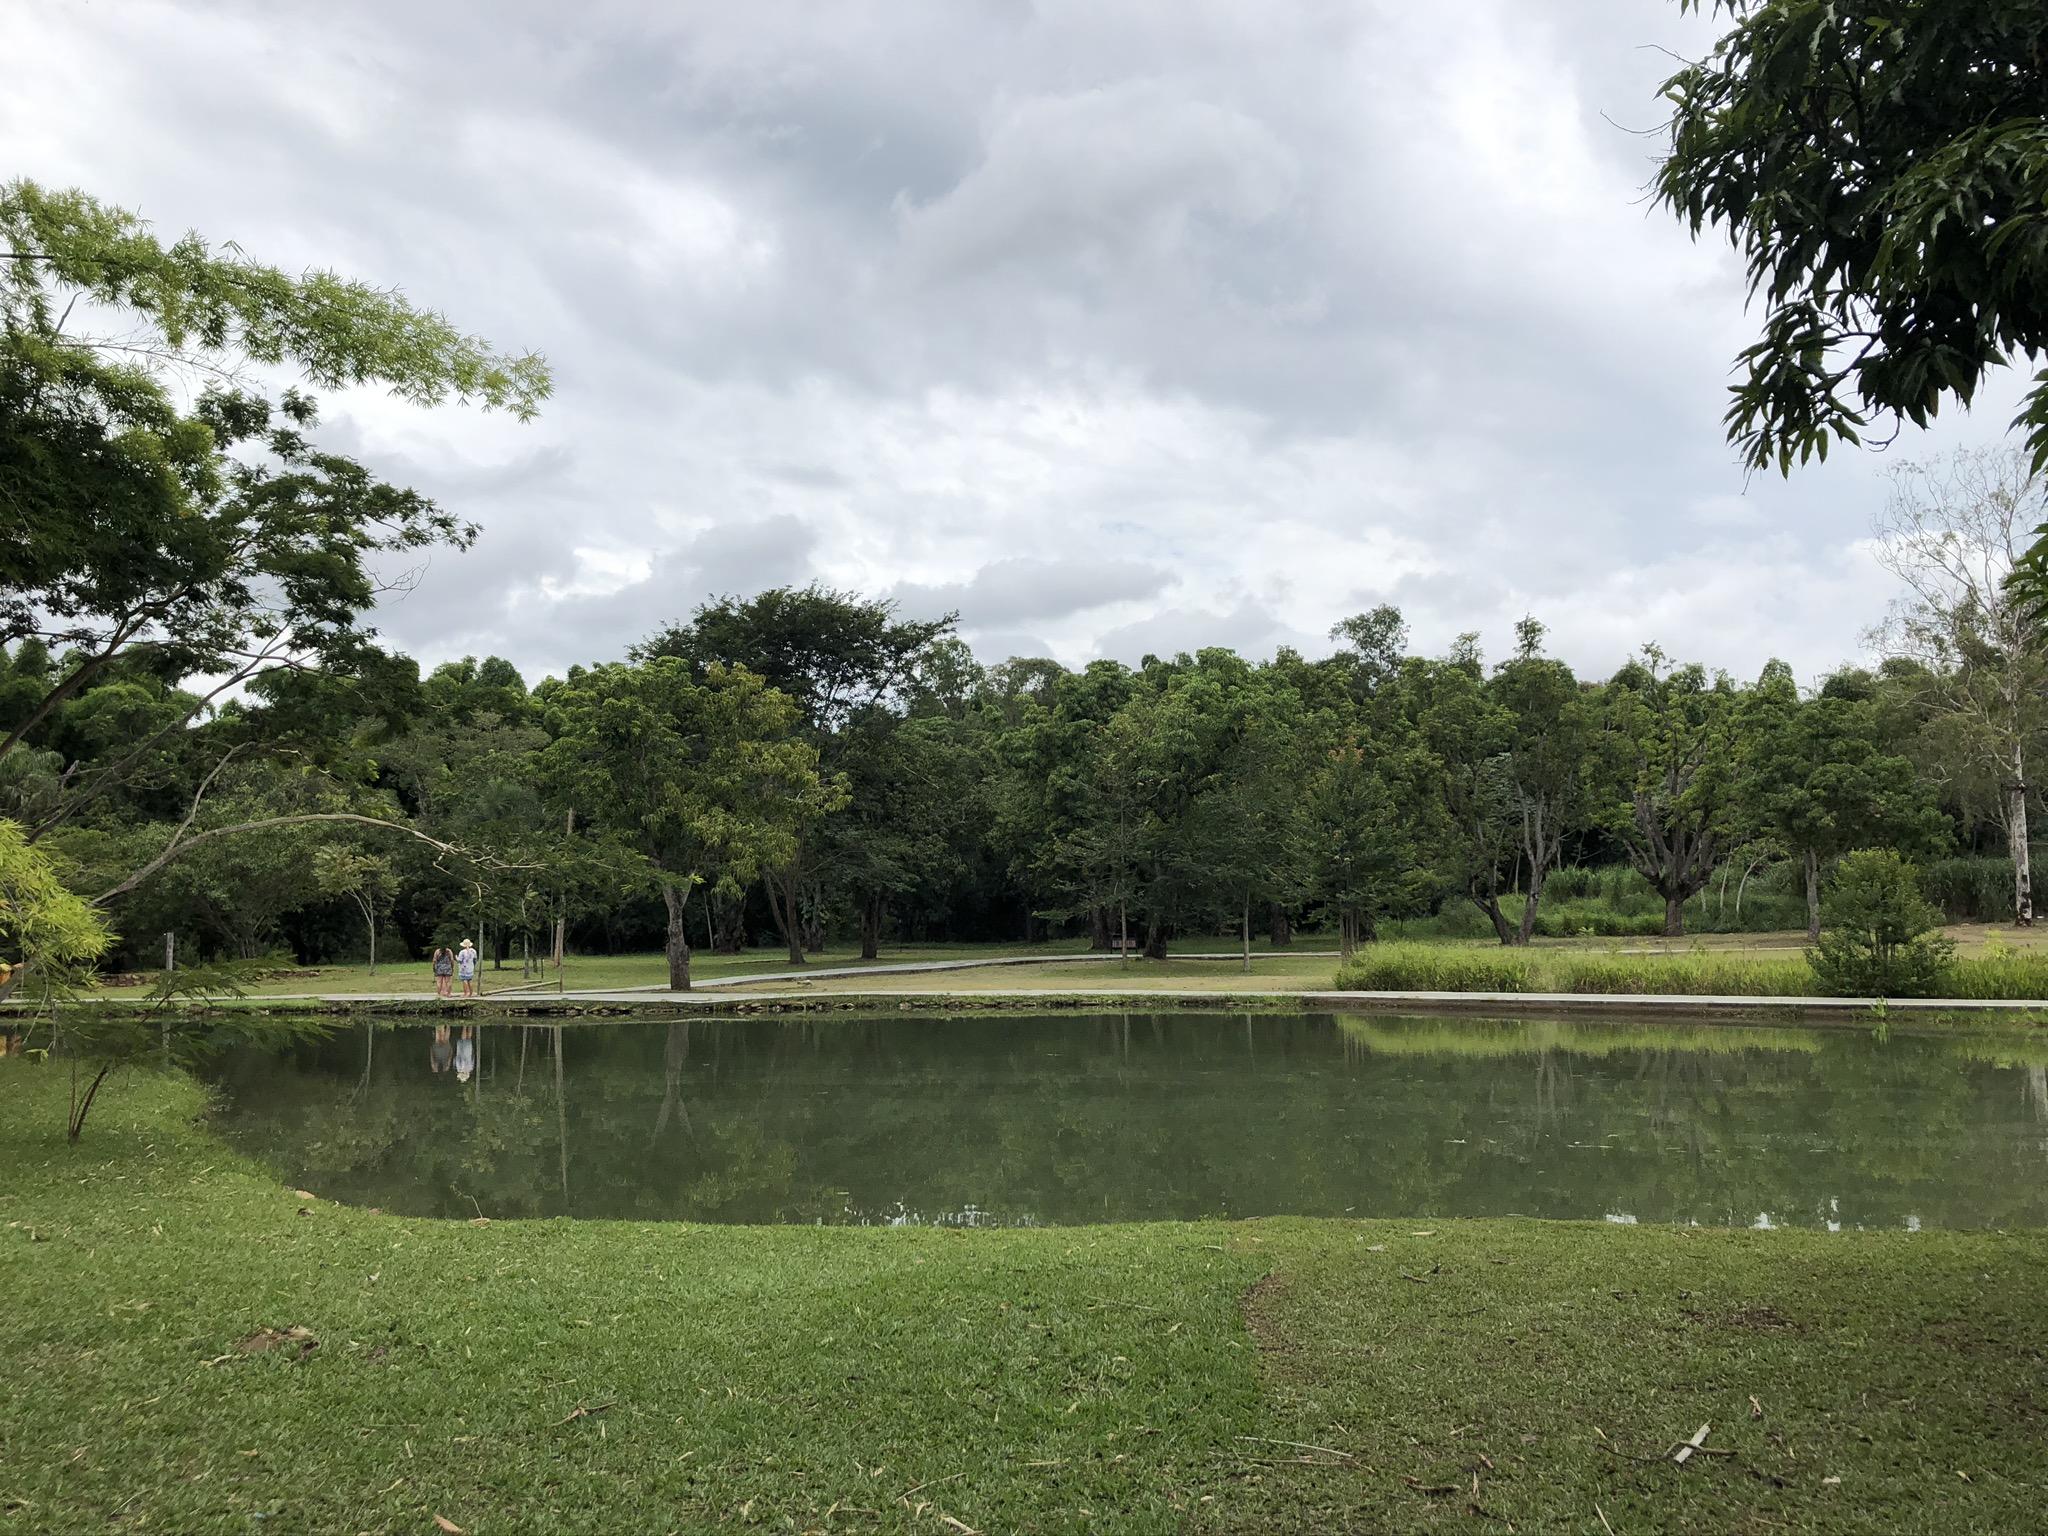 Lagoa Termas Parque - Caldas Novas - GO